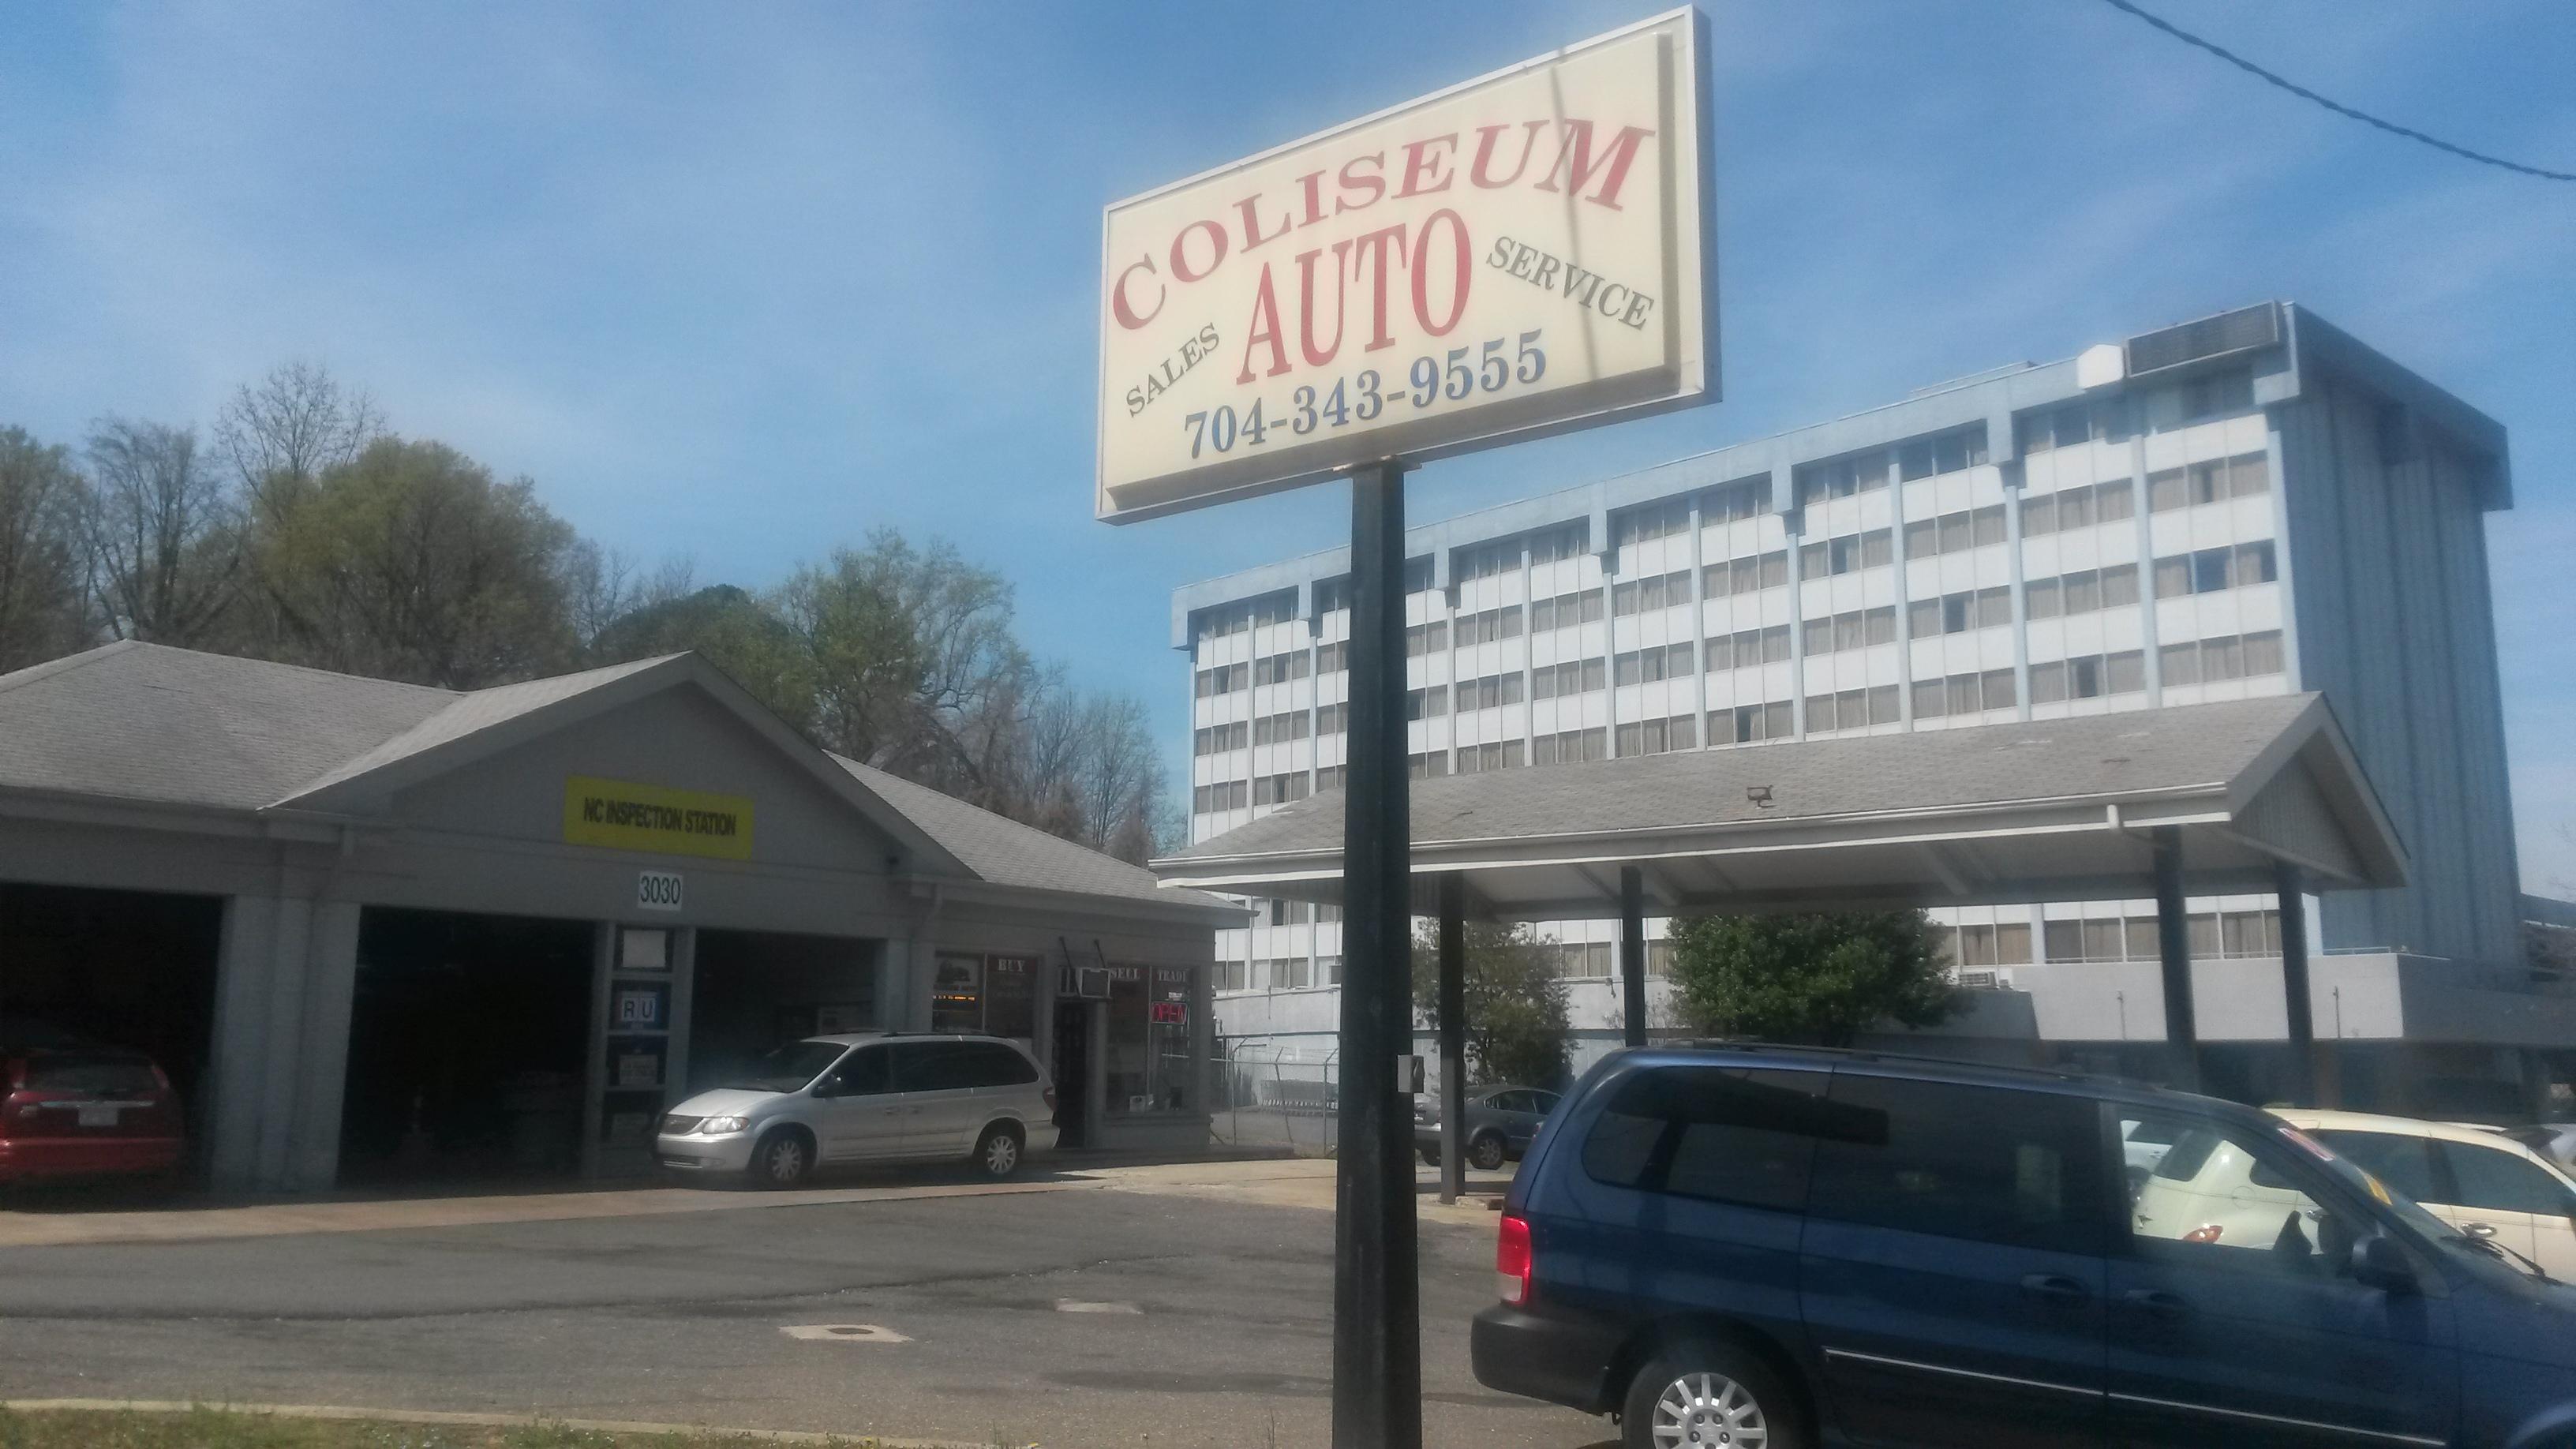 Coliseum Auto Sales & Service 3030 E Independence Blvd Charlotte